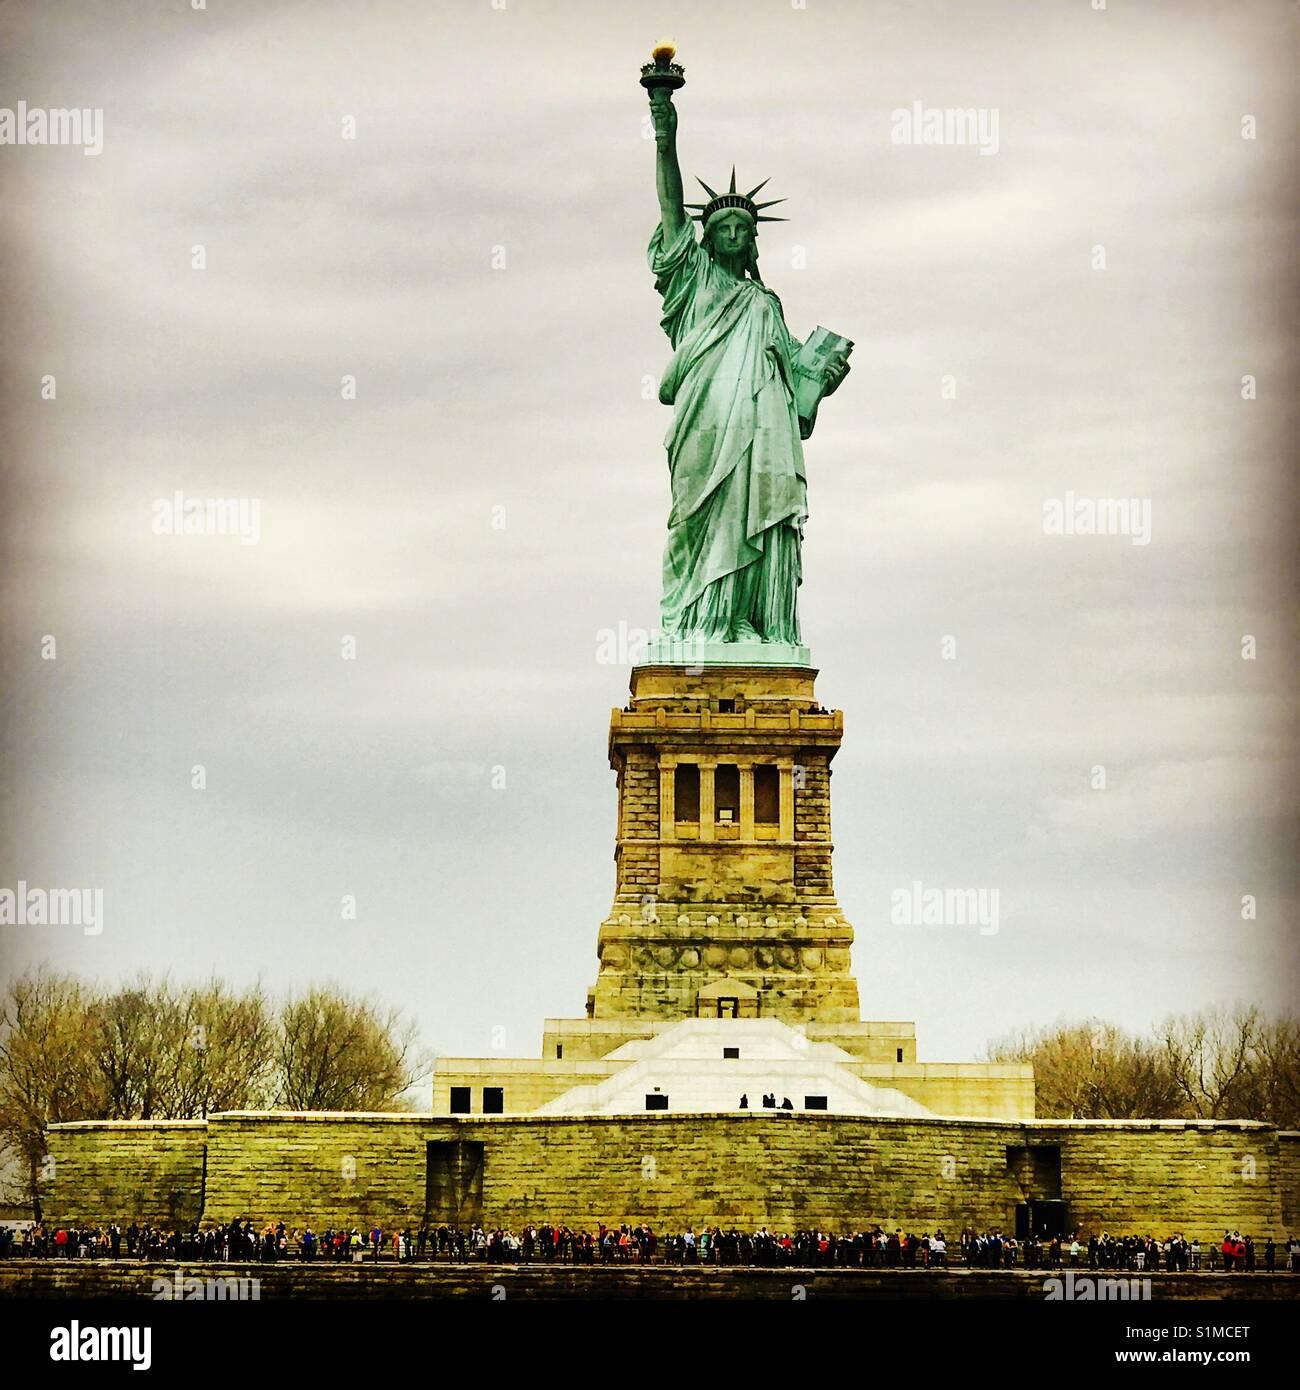 La Statue de la liberté, New York. Photo Stock